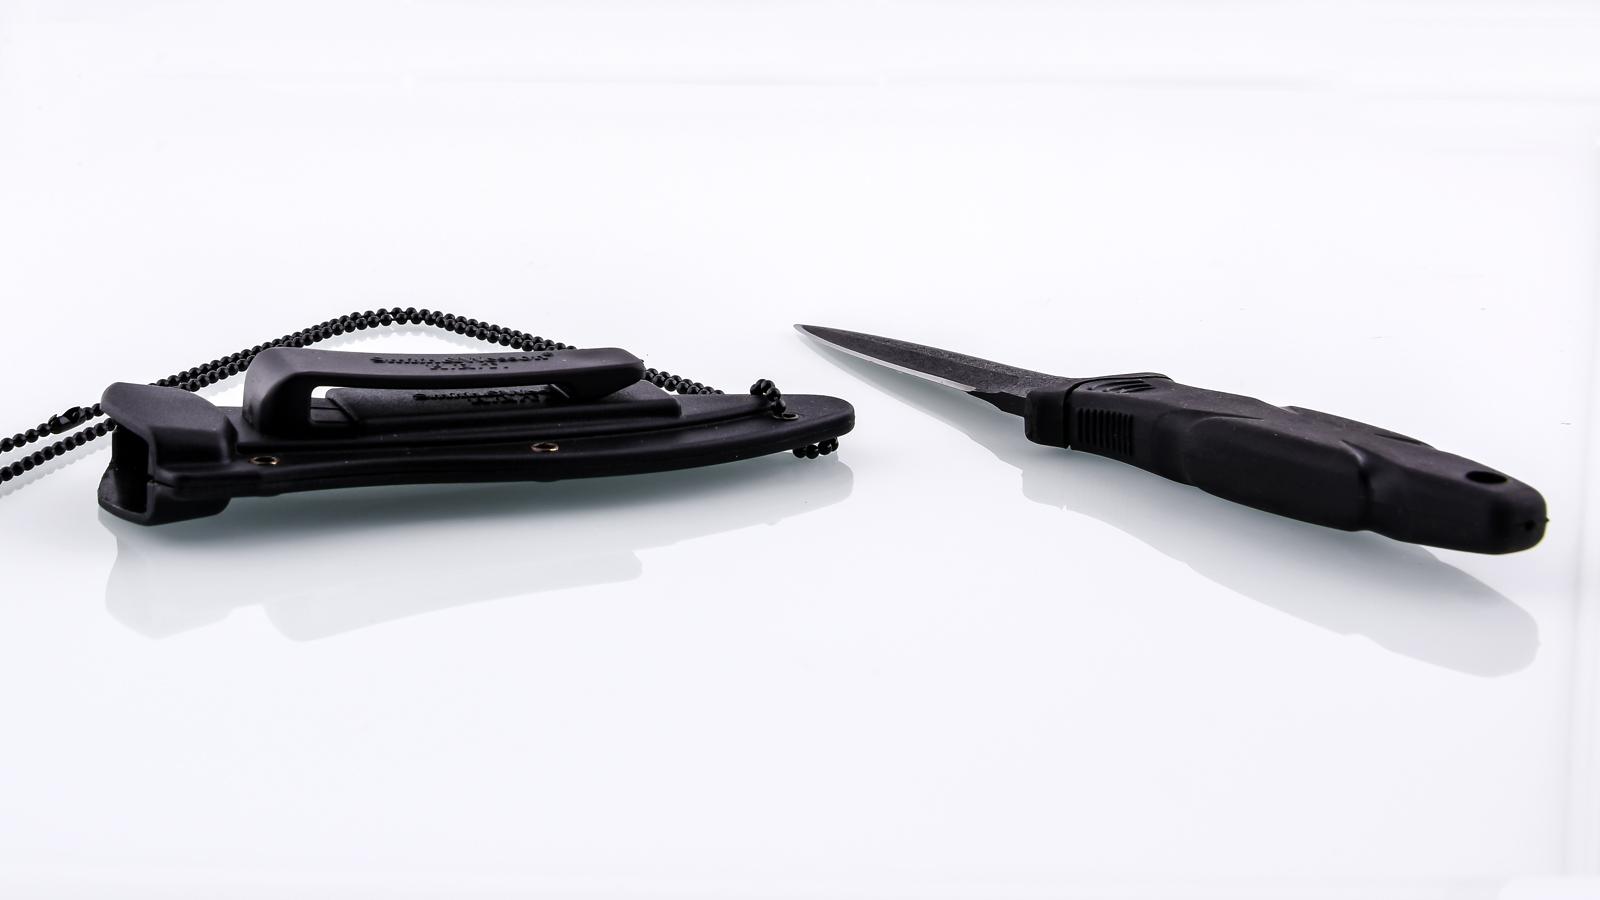 Нож Smith&Wesson с доставкой